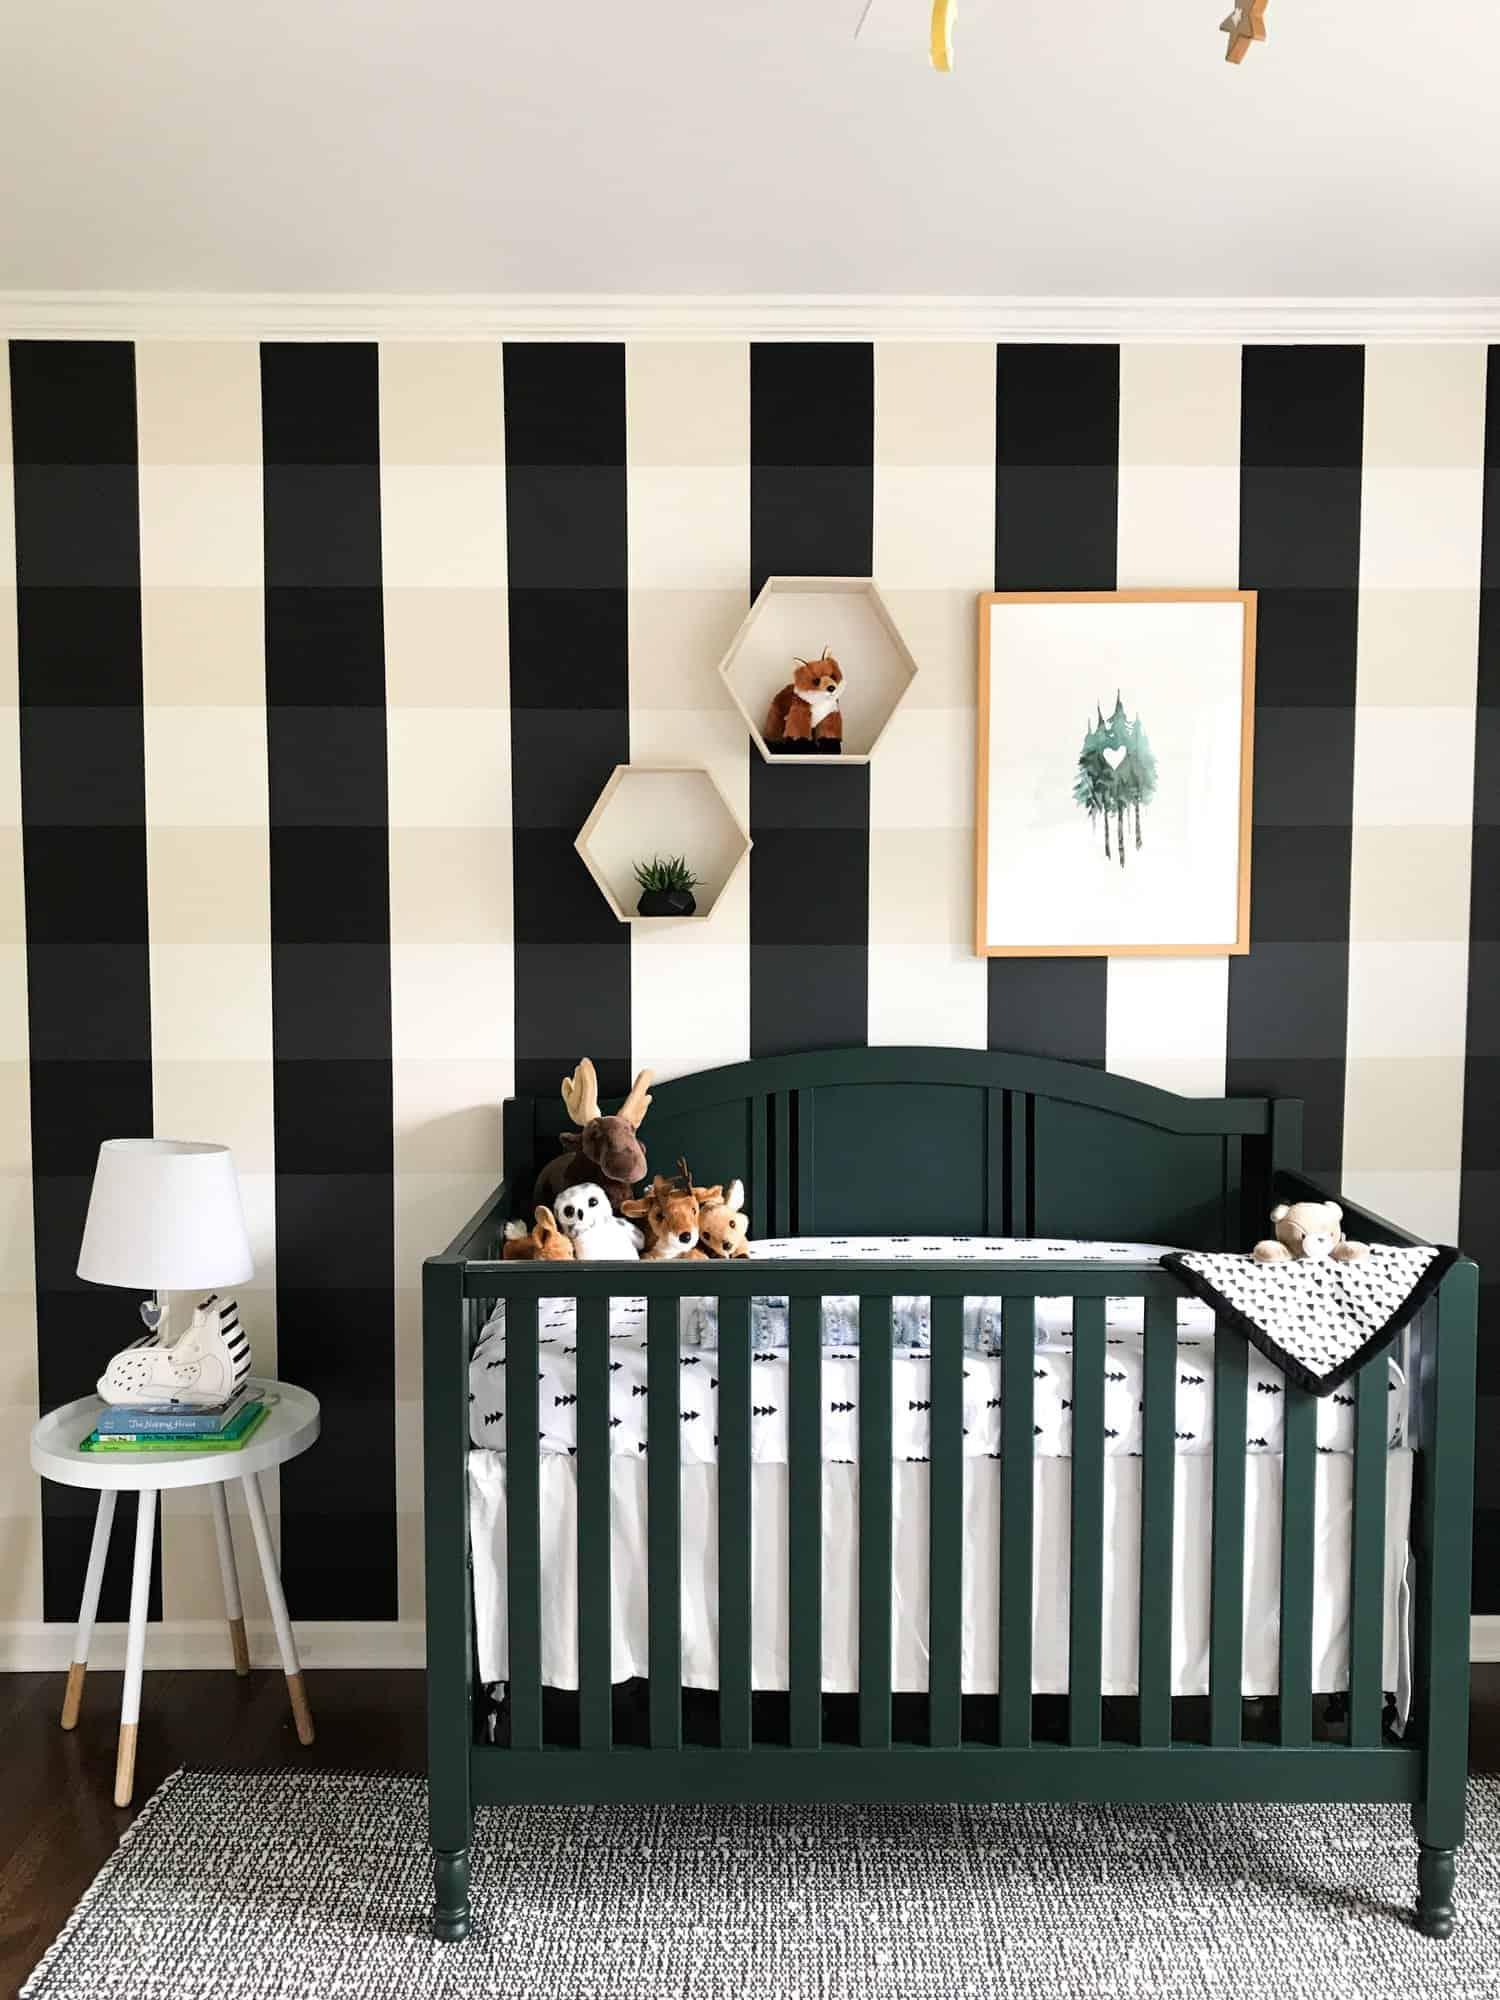 buffalo check wallpaper in nursery